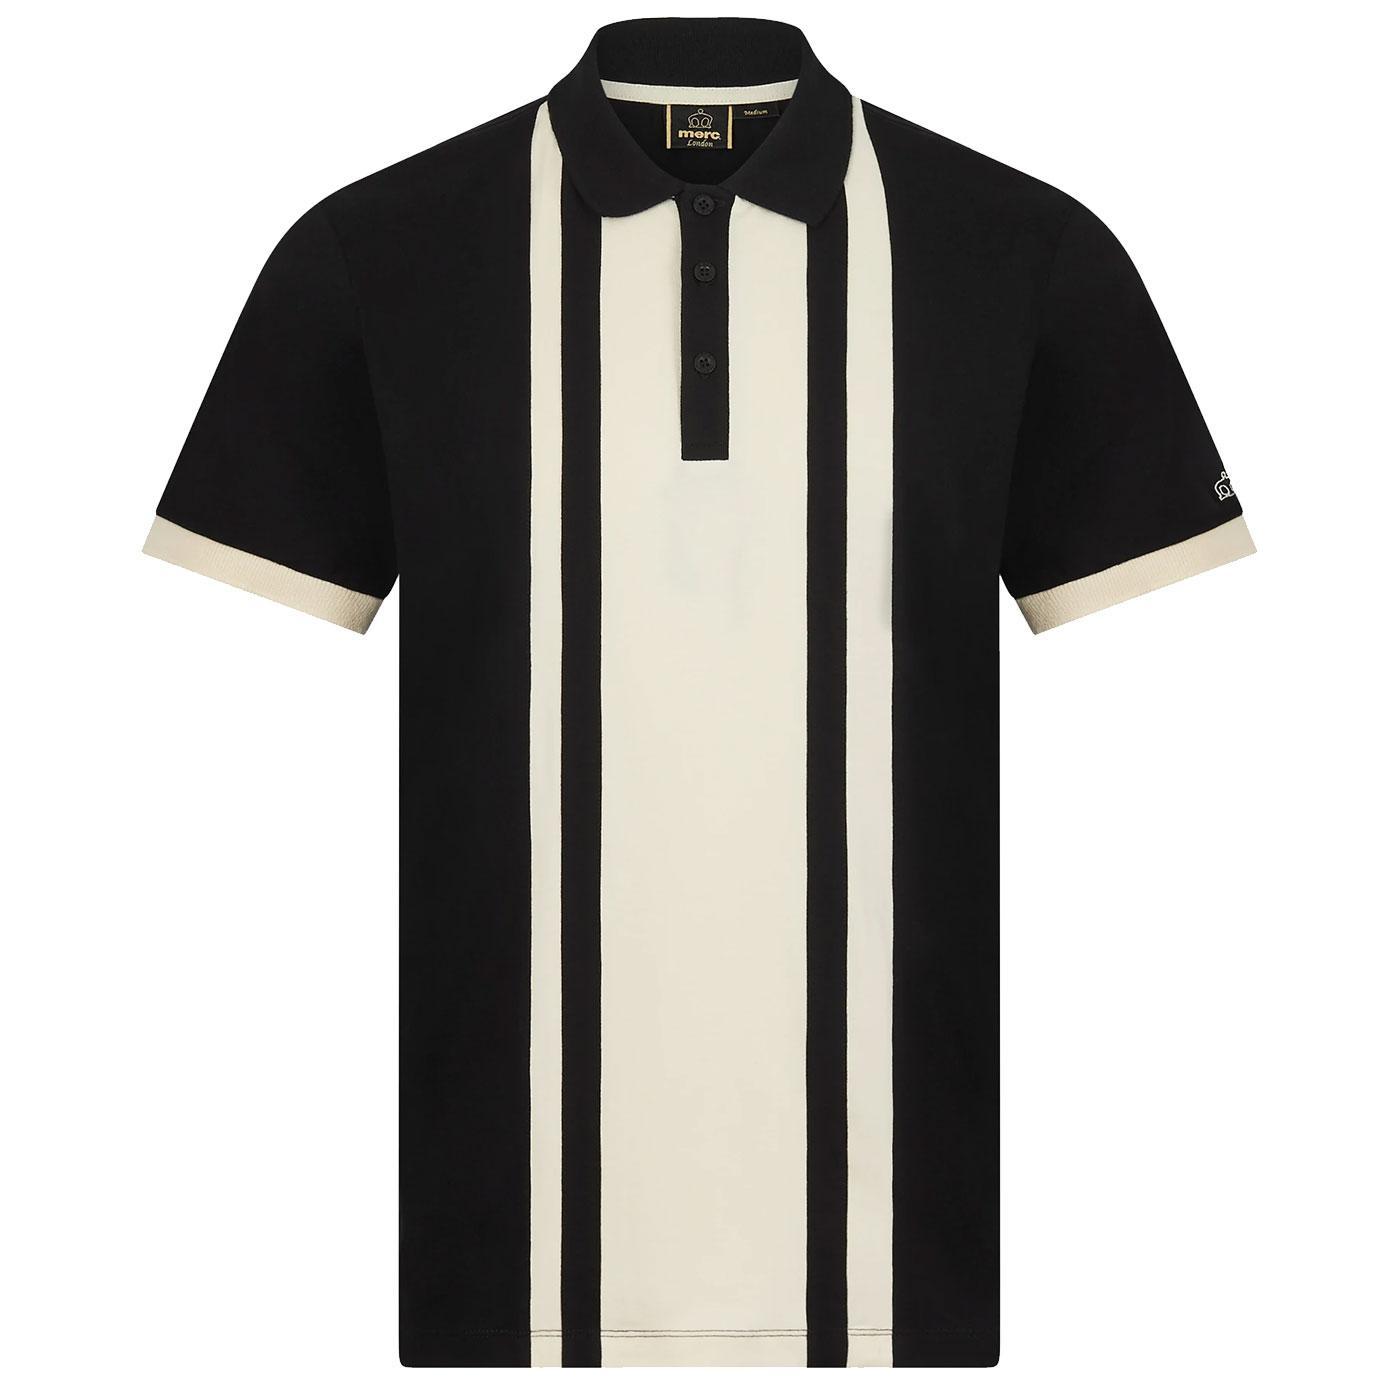 Fry MERC Retro Mod Veritcal Cut & Sew Stripe Polo